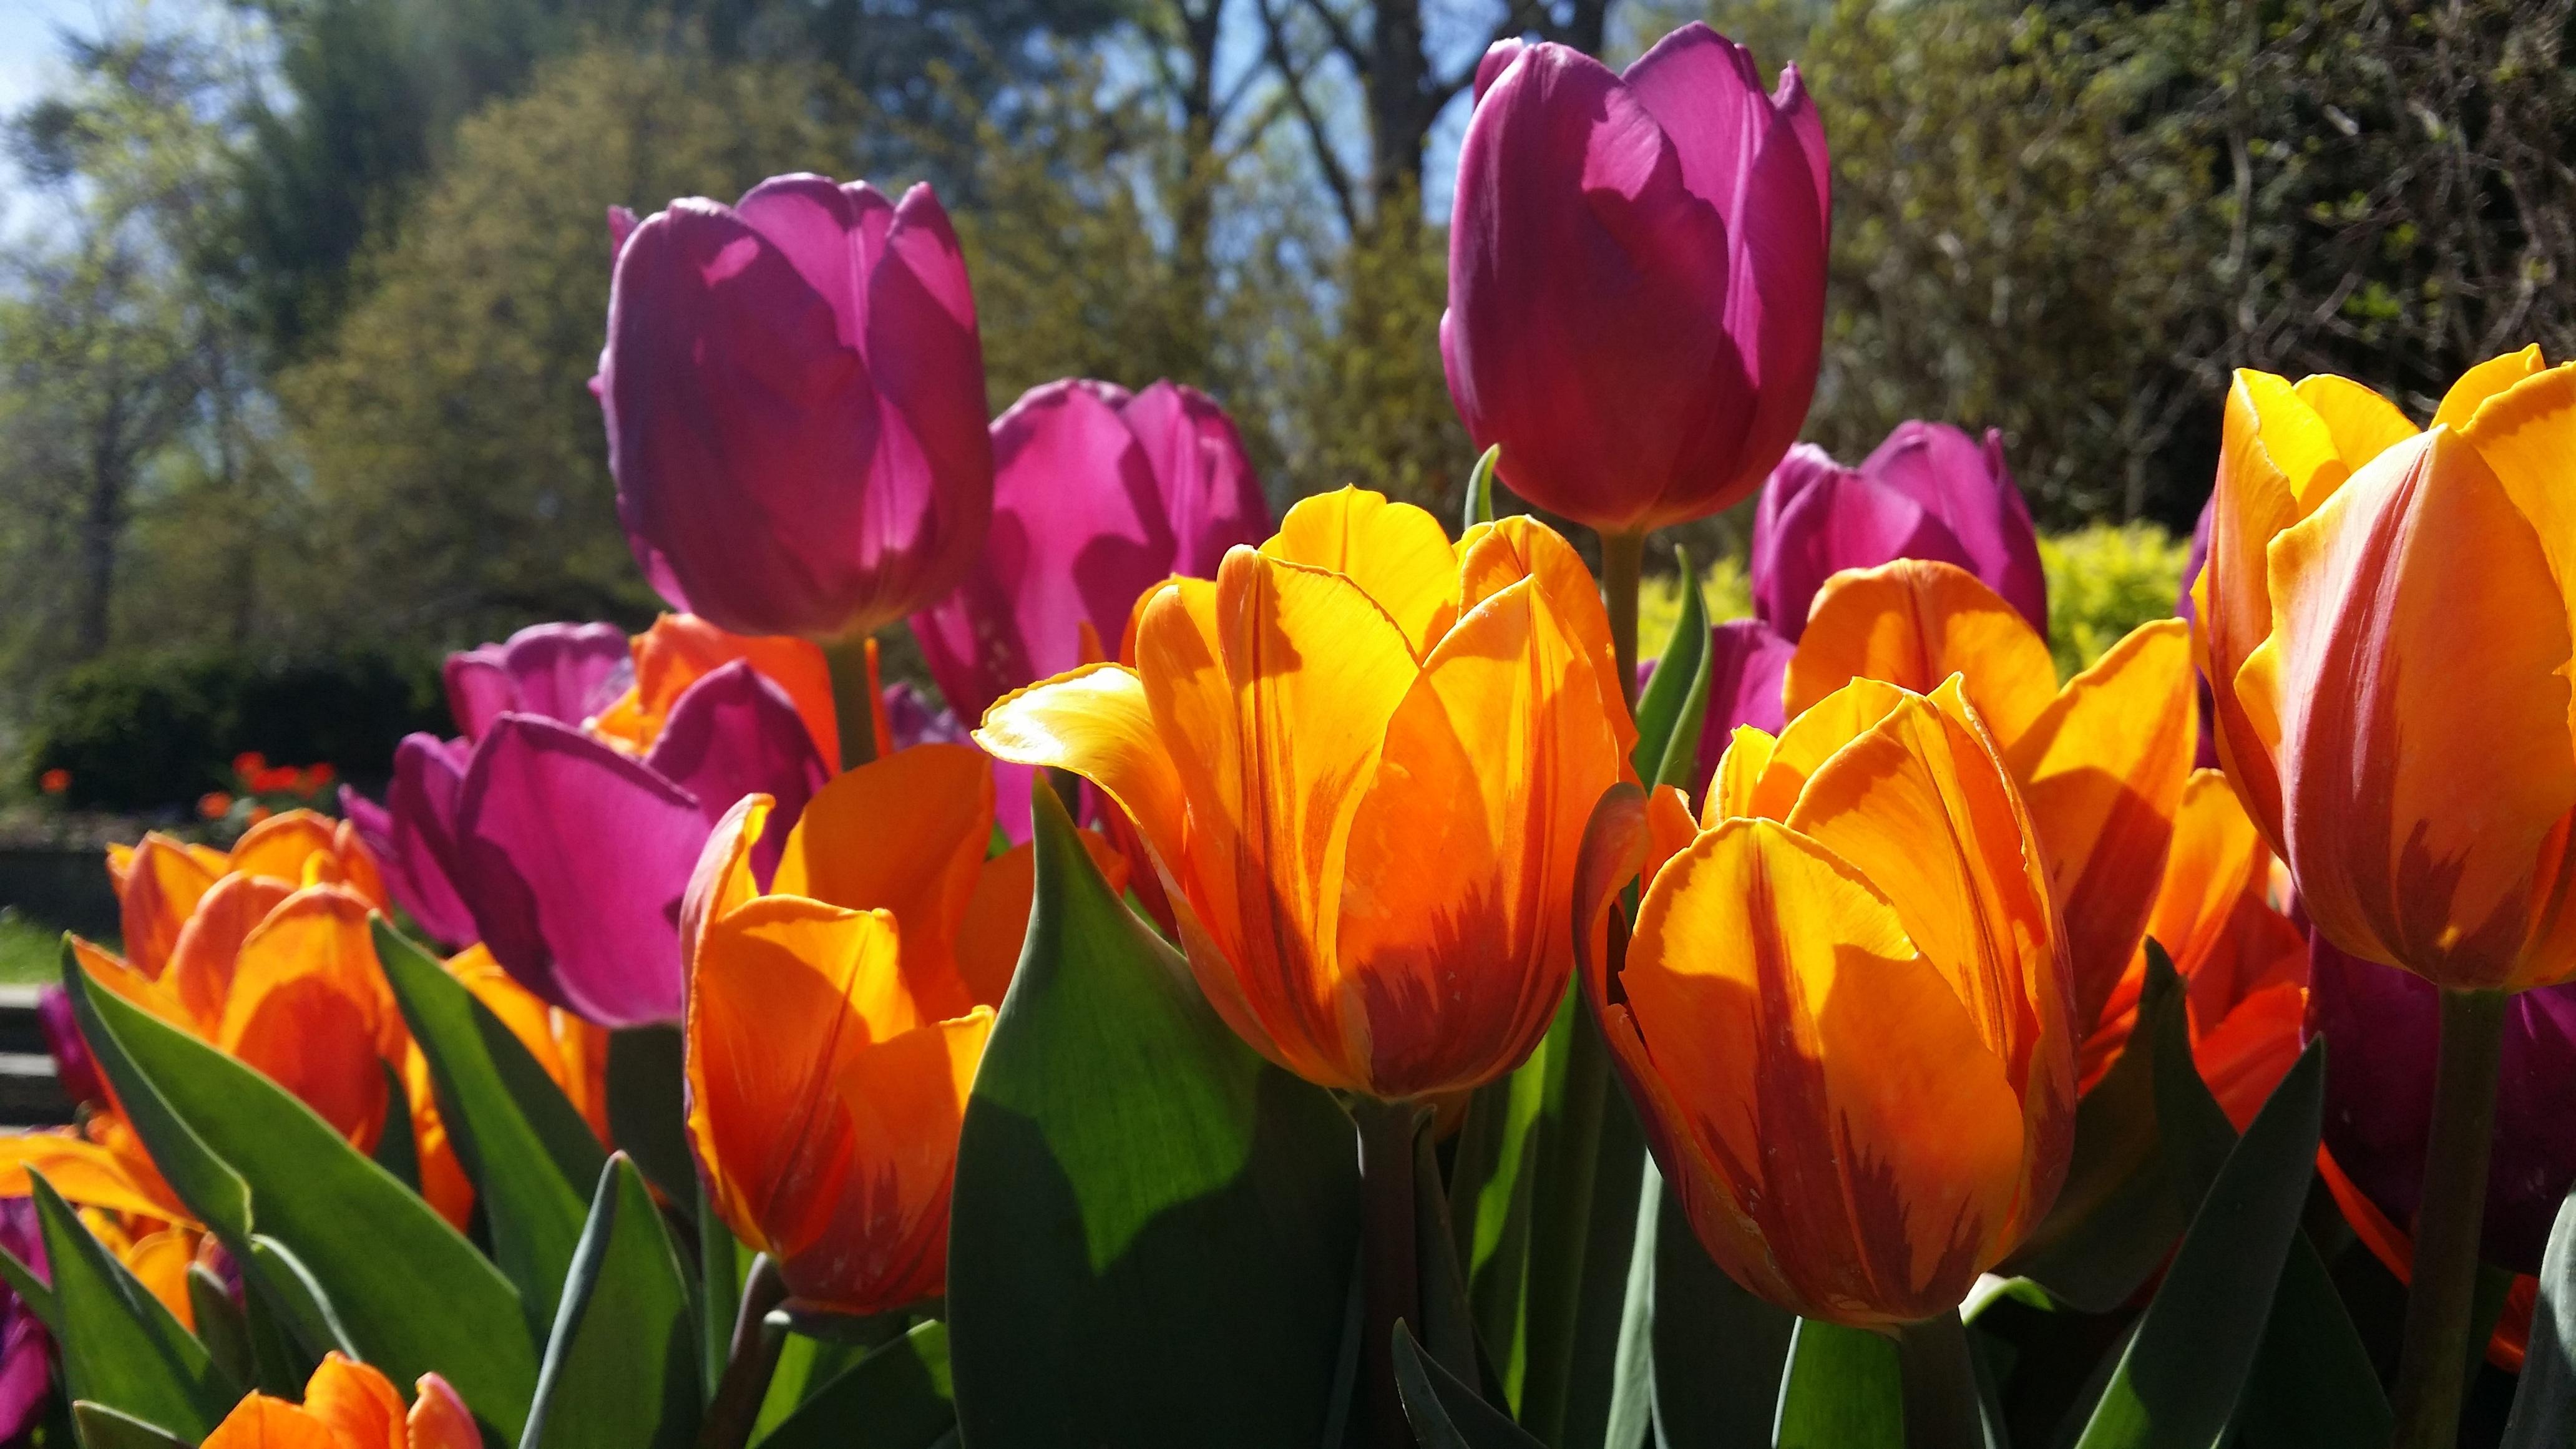 Free Images : nature, flower, purple, petal, bloom, floral, tulip ...